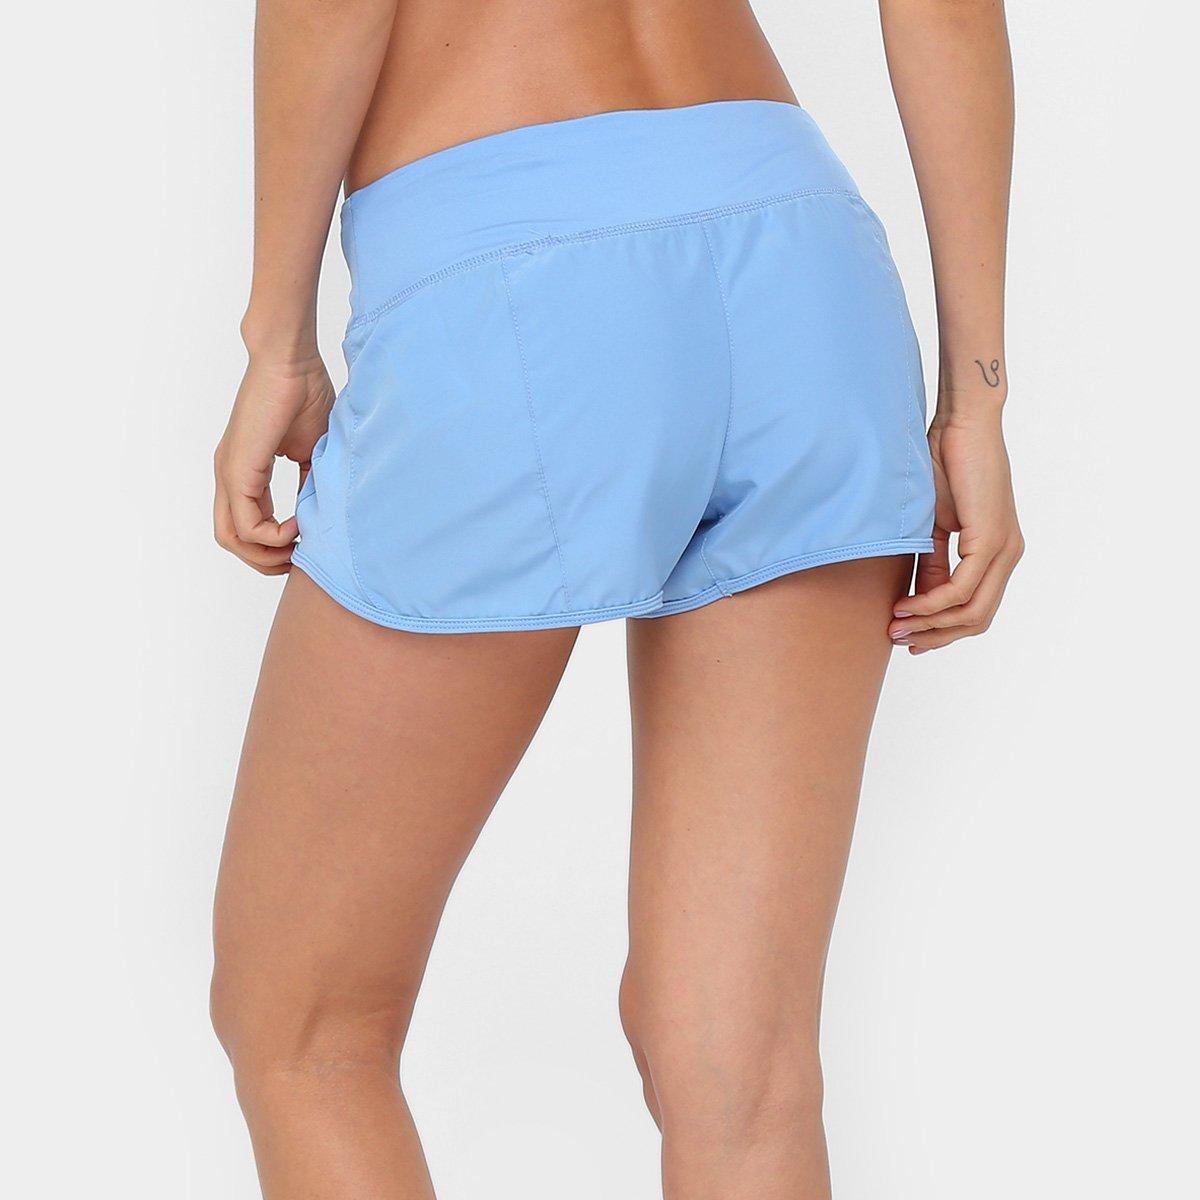 c92951f210 Short Nike Crew Dri-Fit Feminino - Compre Agora